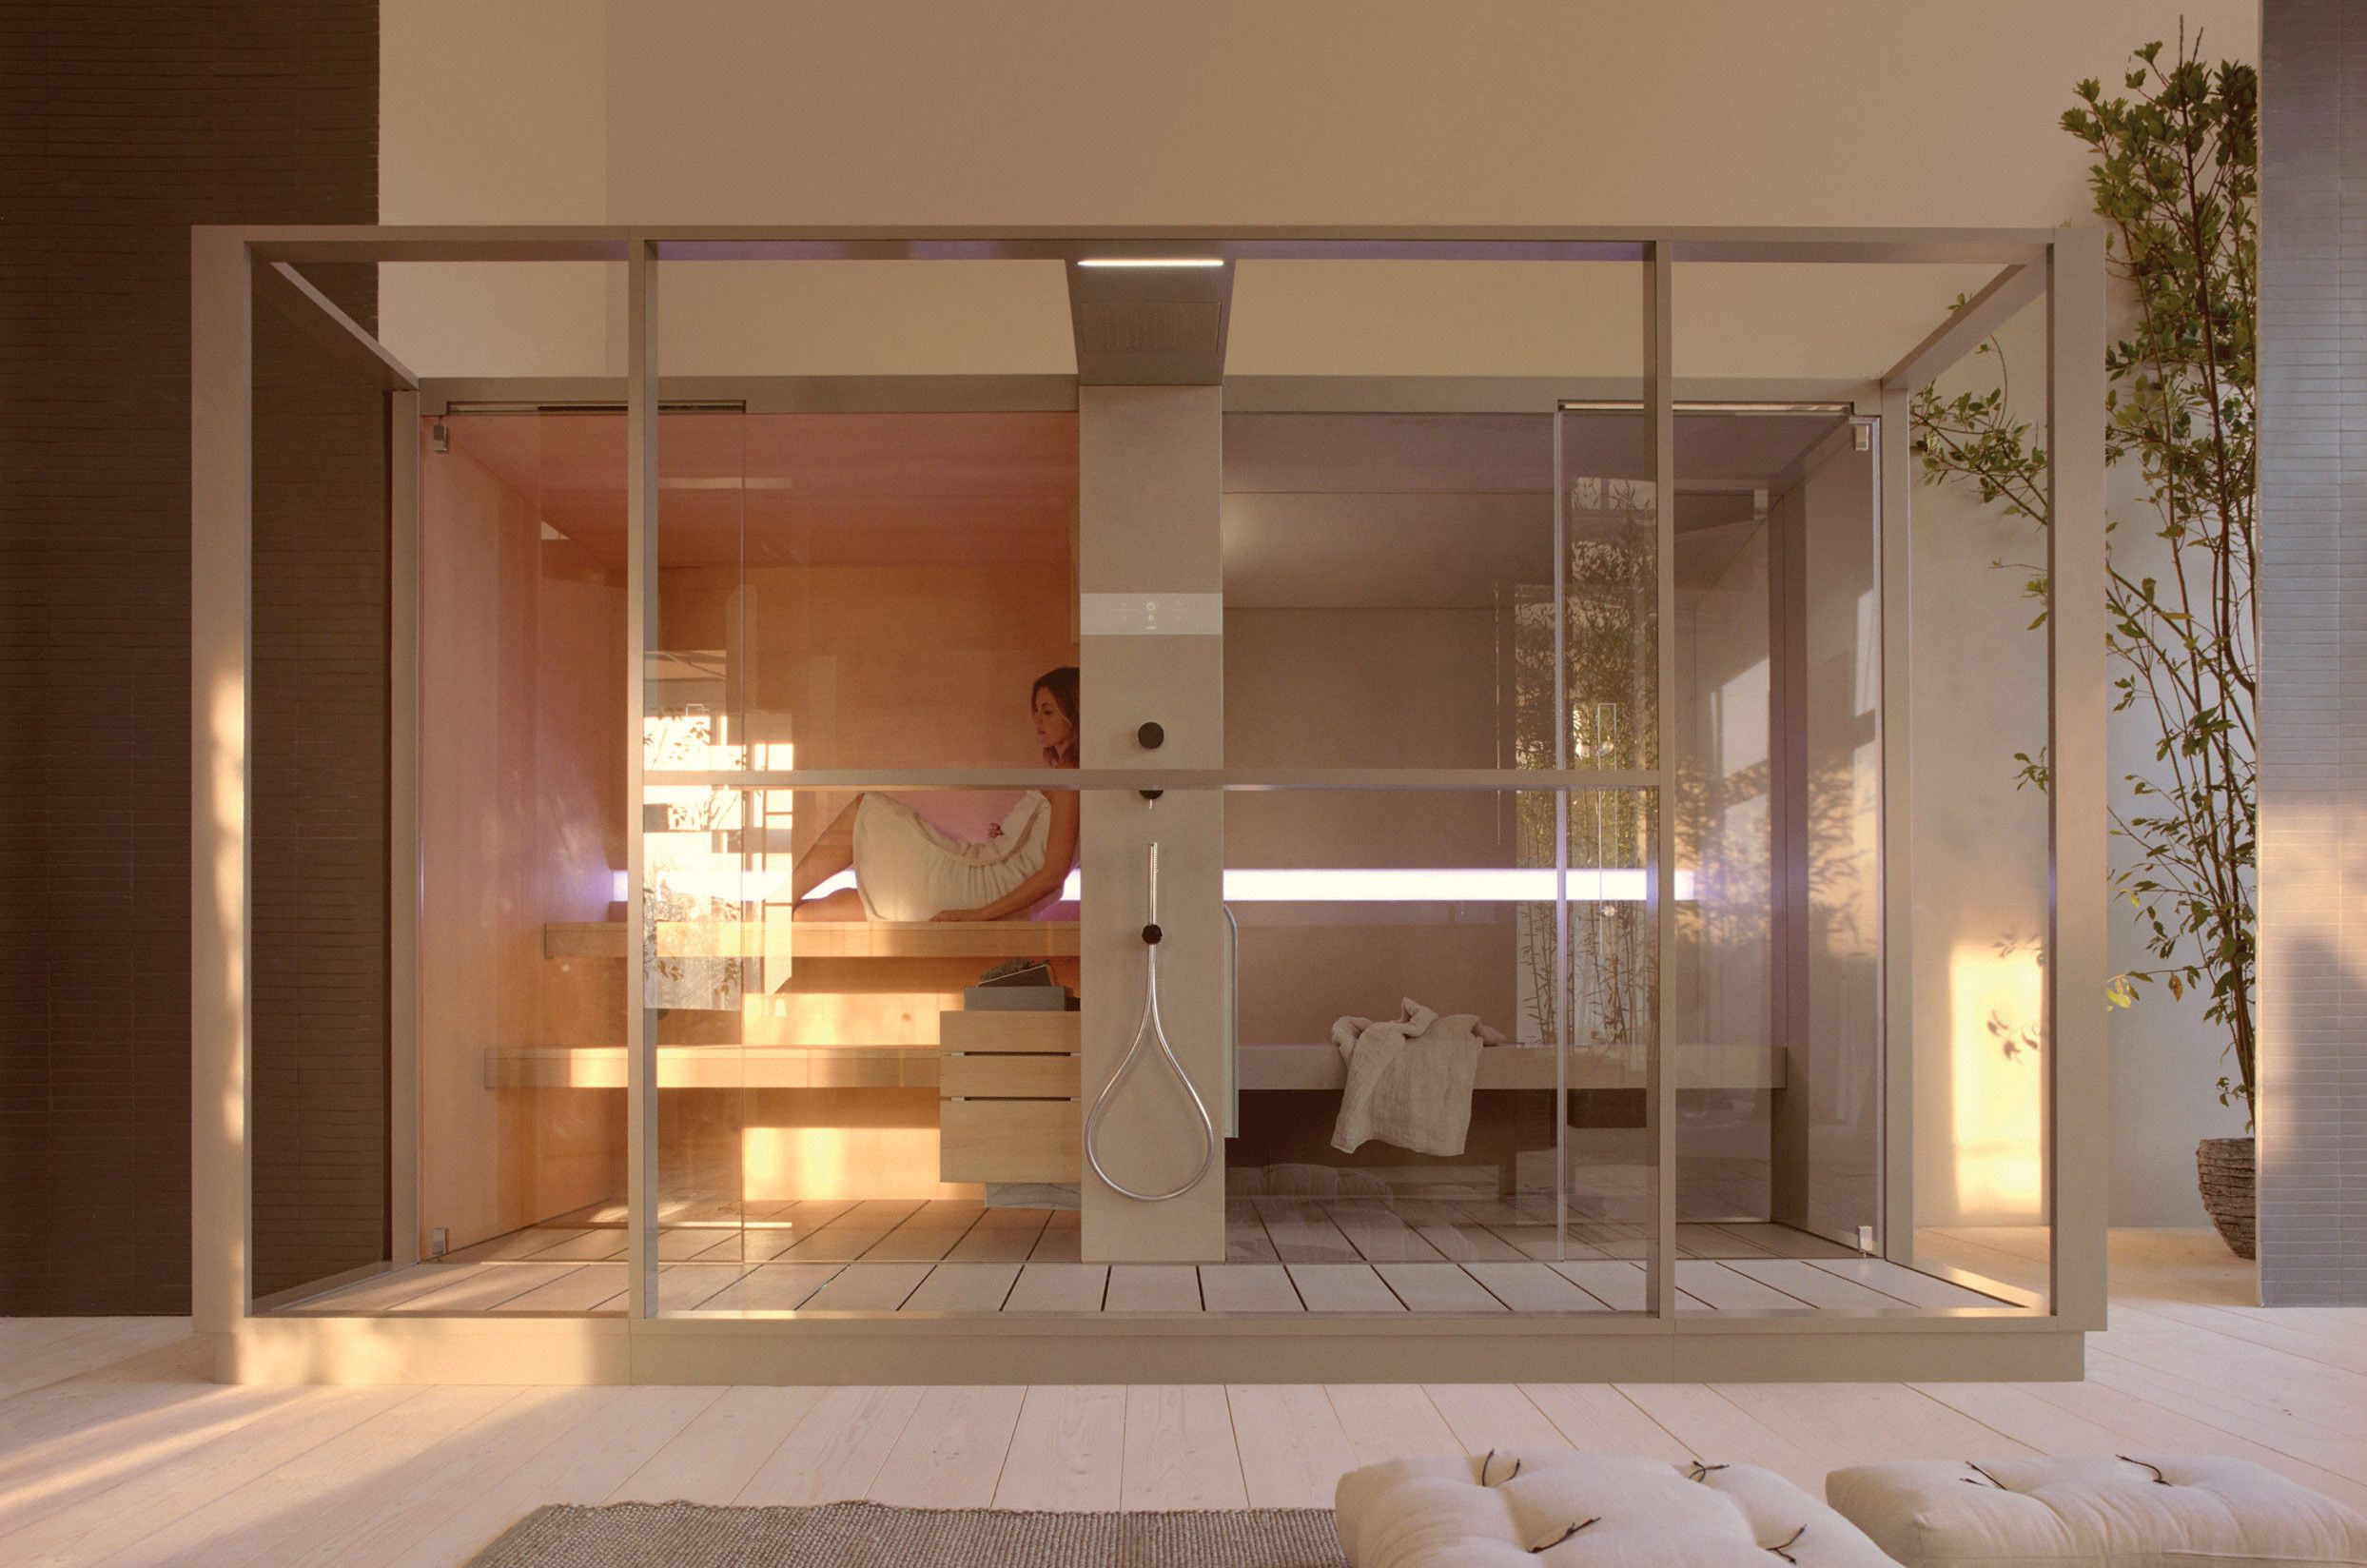 Sauna e bagno turco in una soluzione unica, collegati da un elegante ...